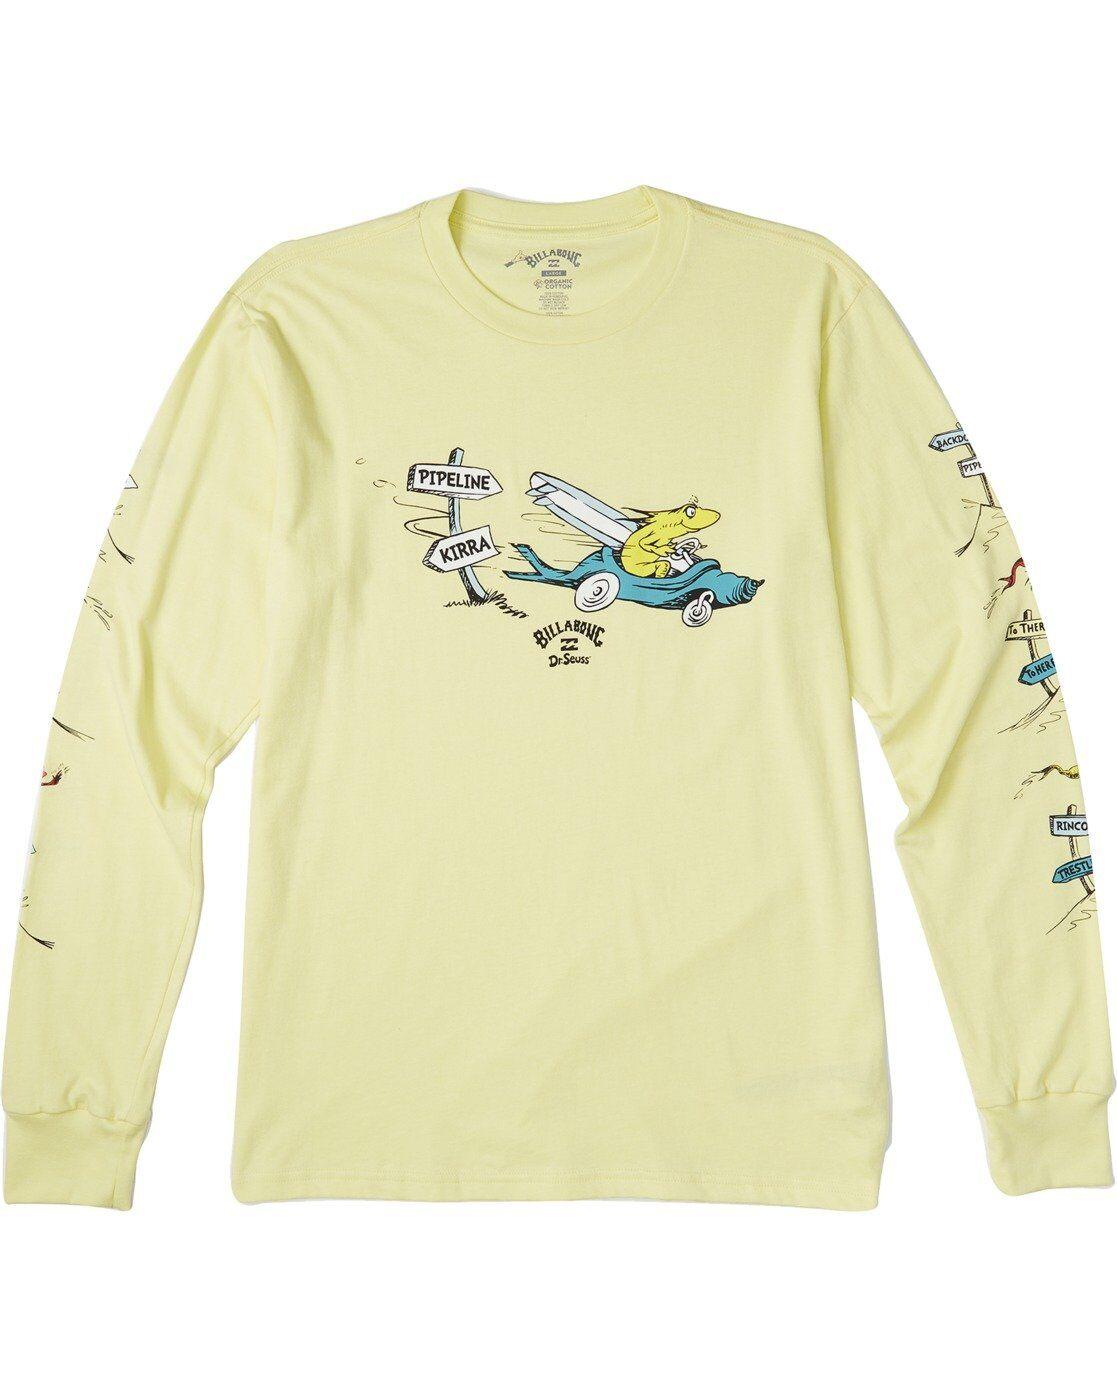 Billabong Boys' Little Car Long Sleeve T-Shirt  - Yellow - Size: Extra Large